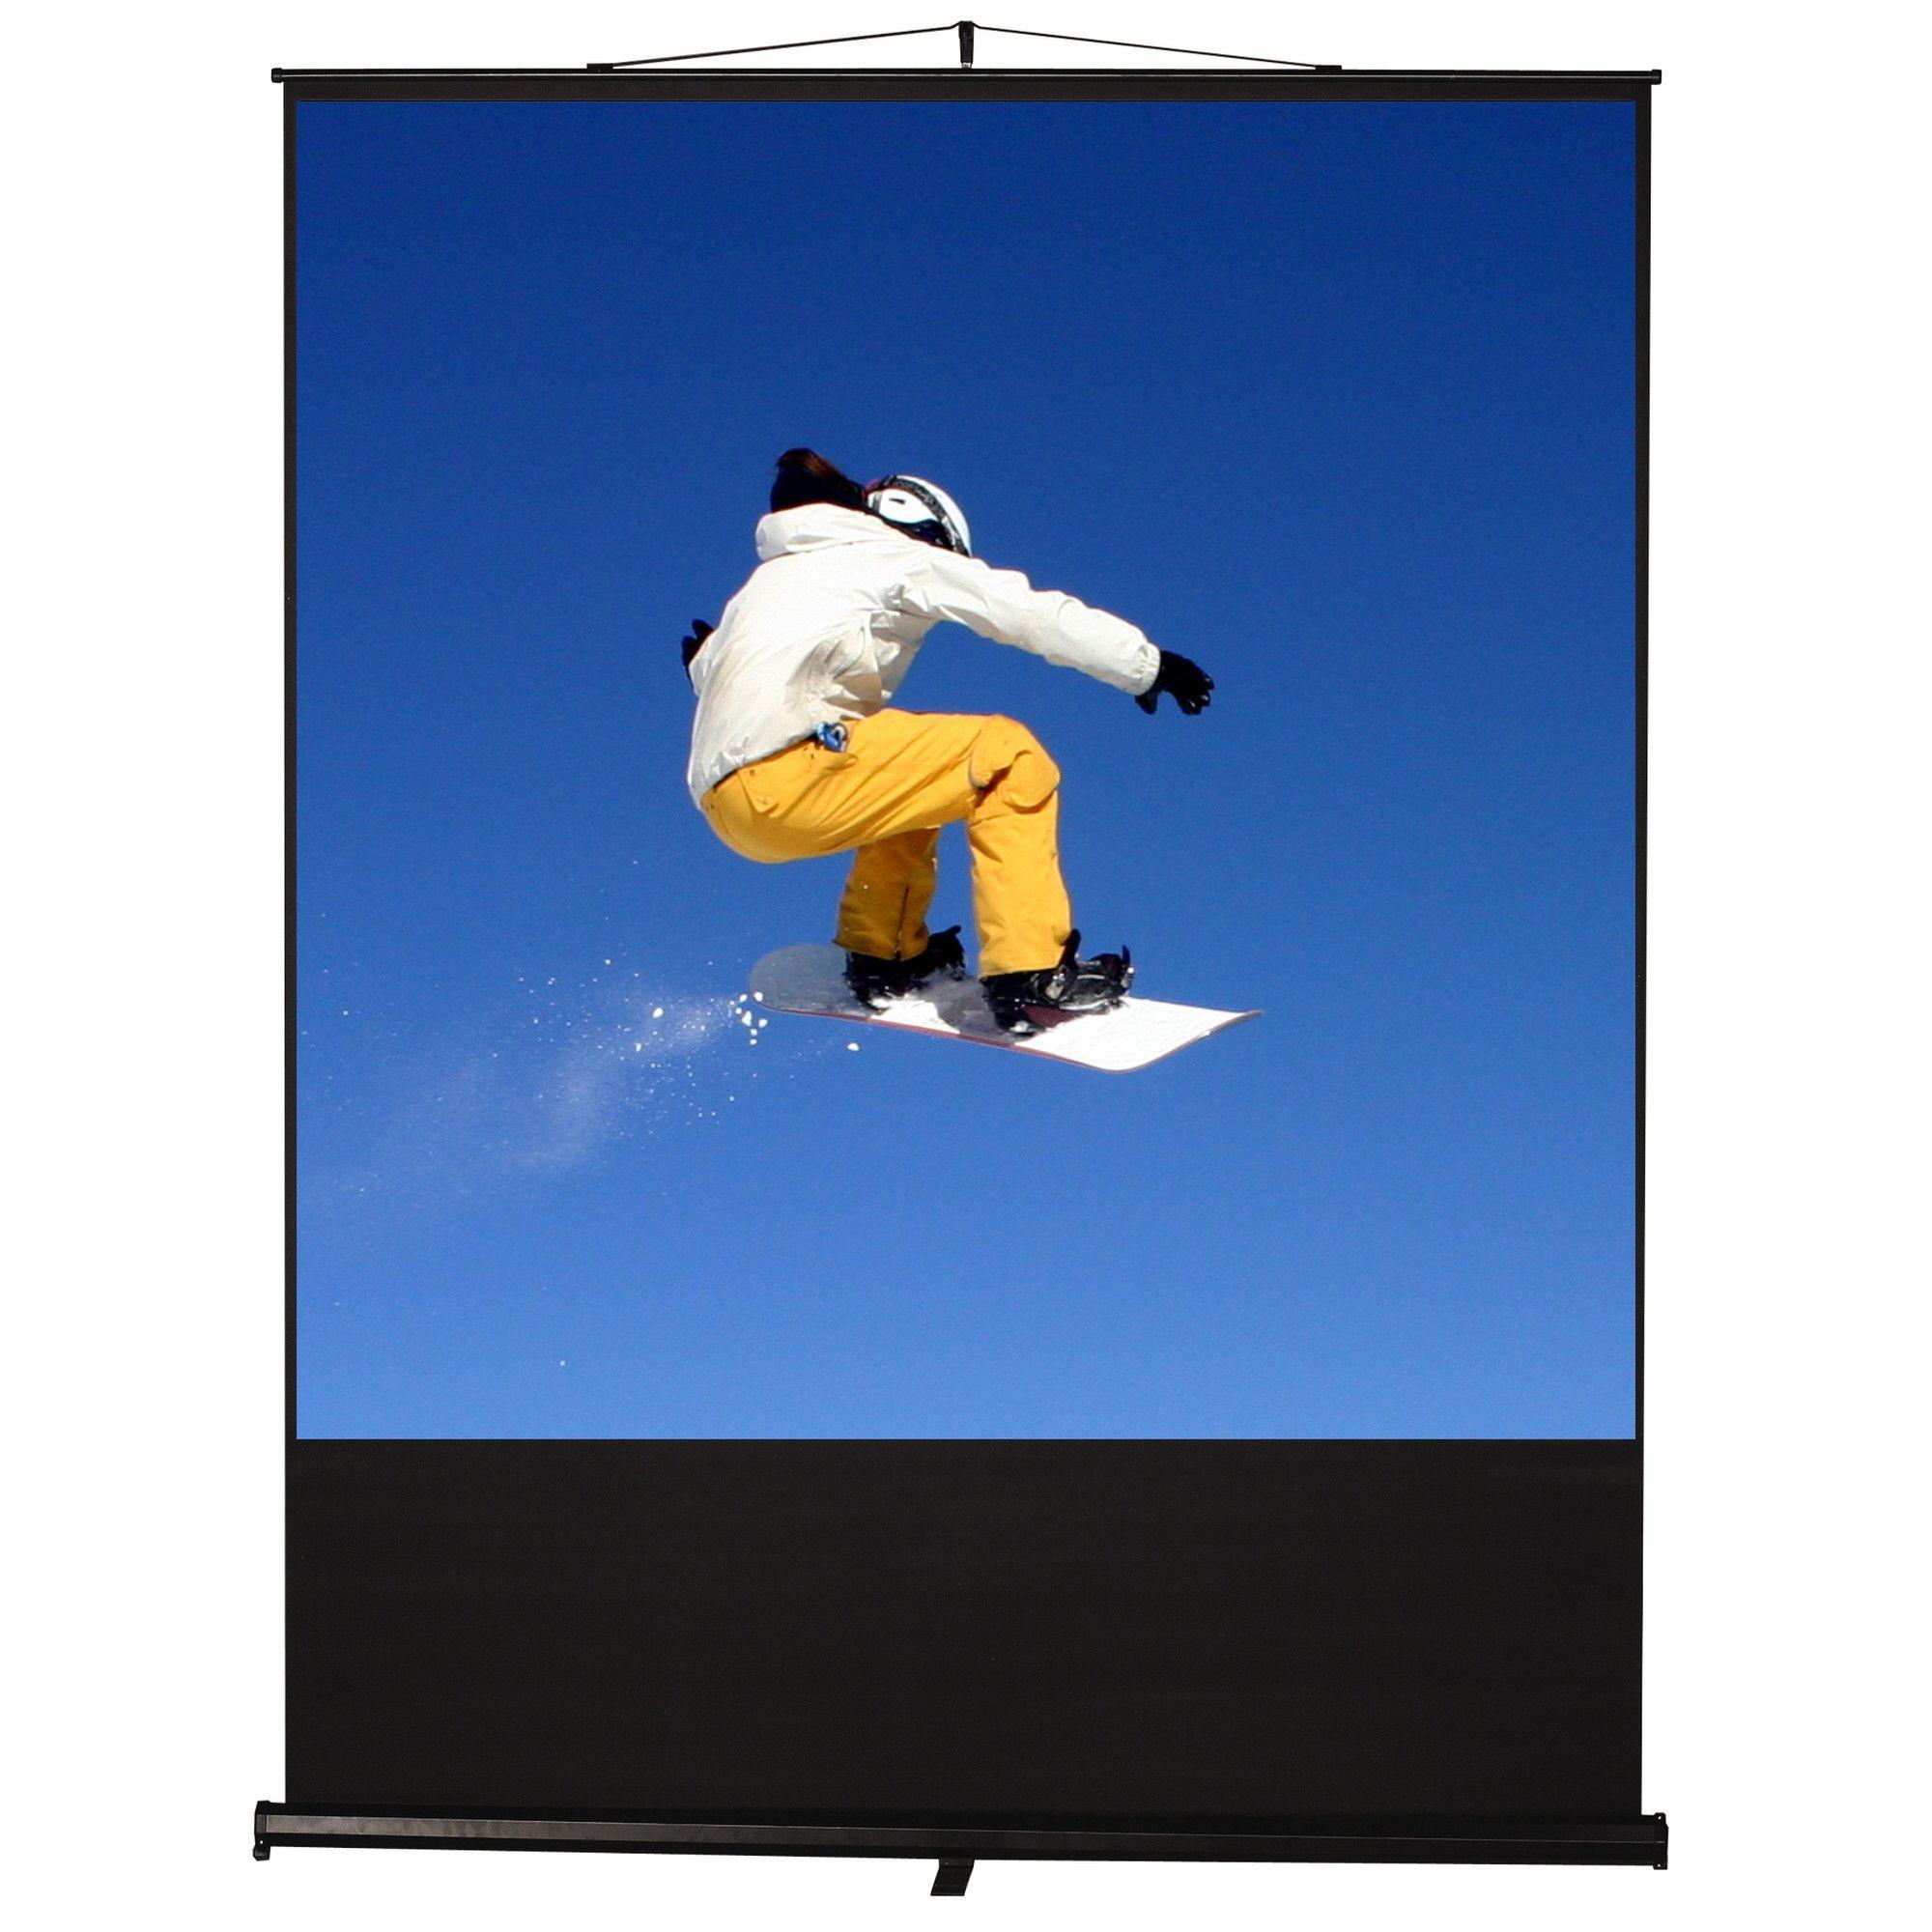 "Clarity Matt White 100"" Projection Screen"